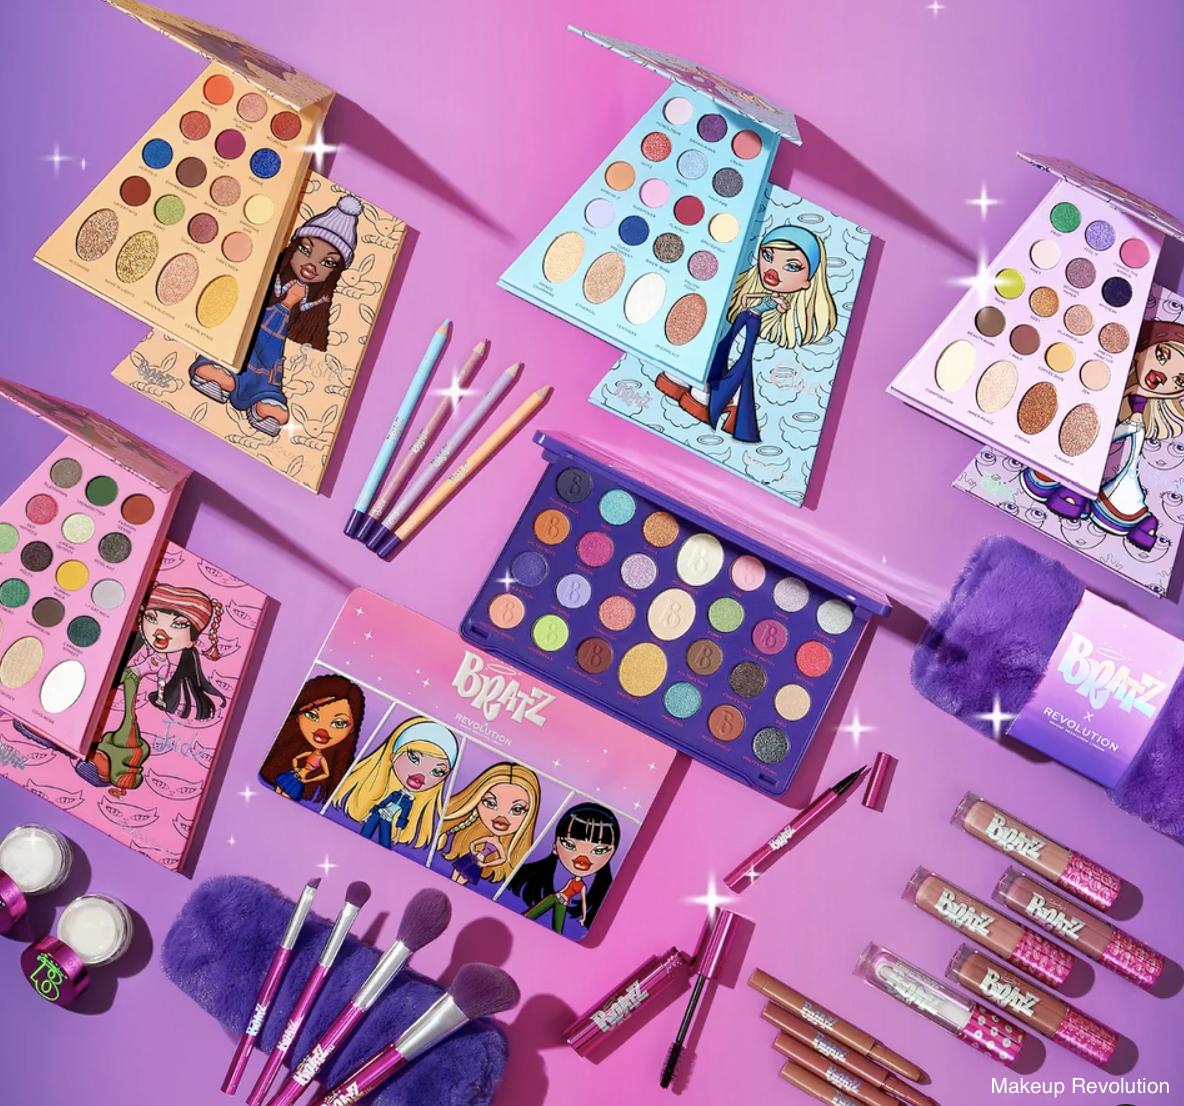 Breaking Beauty News: Makeup Revolution x Bratz, Charlotte Tilbury & More!